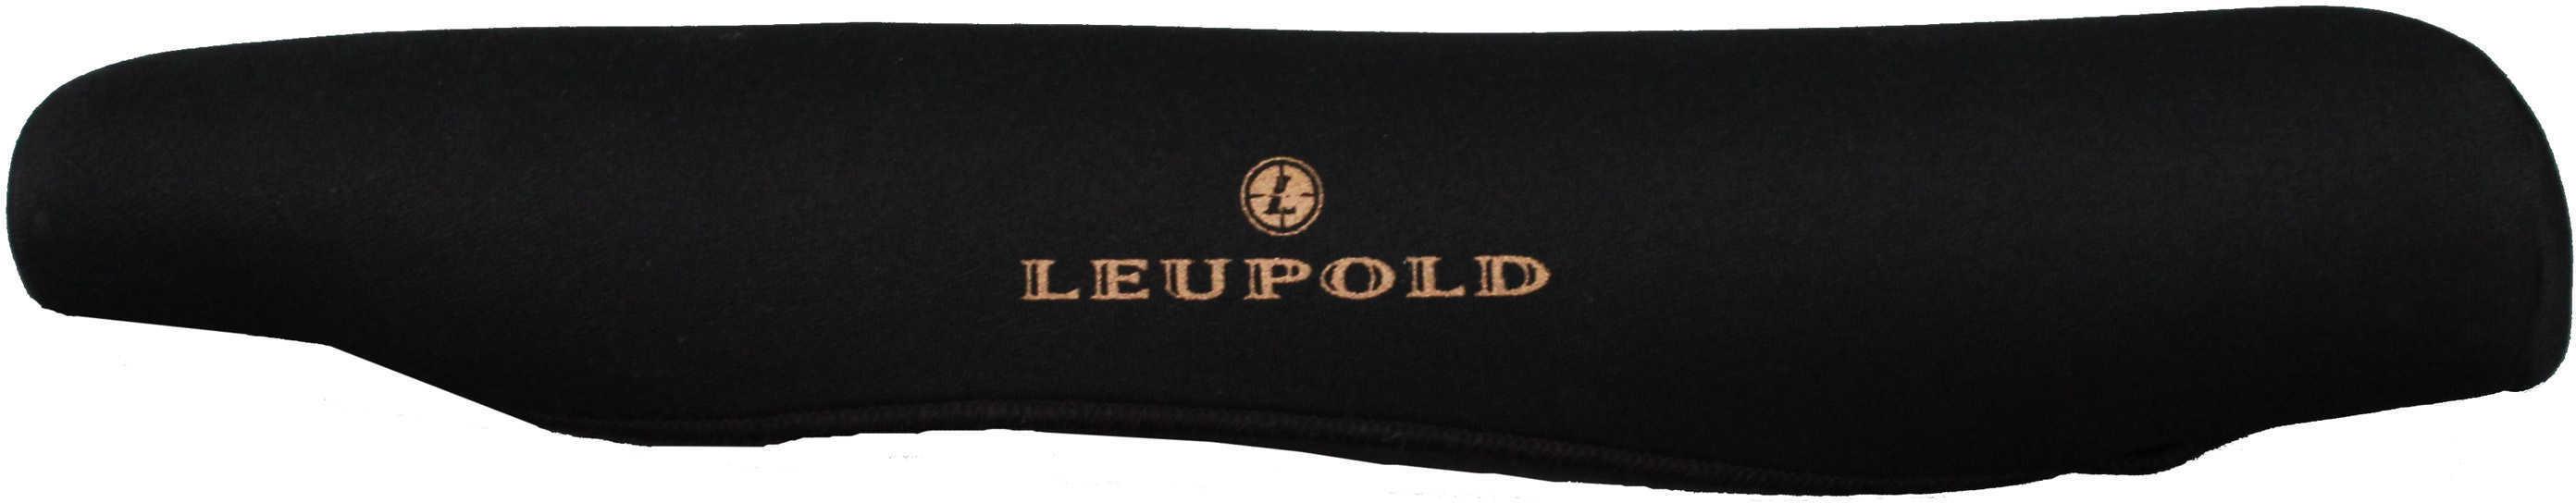 Leupold Scope Smith Scope Cover Xxl Md: 53580